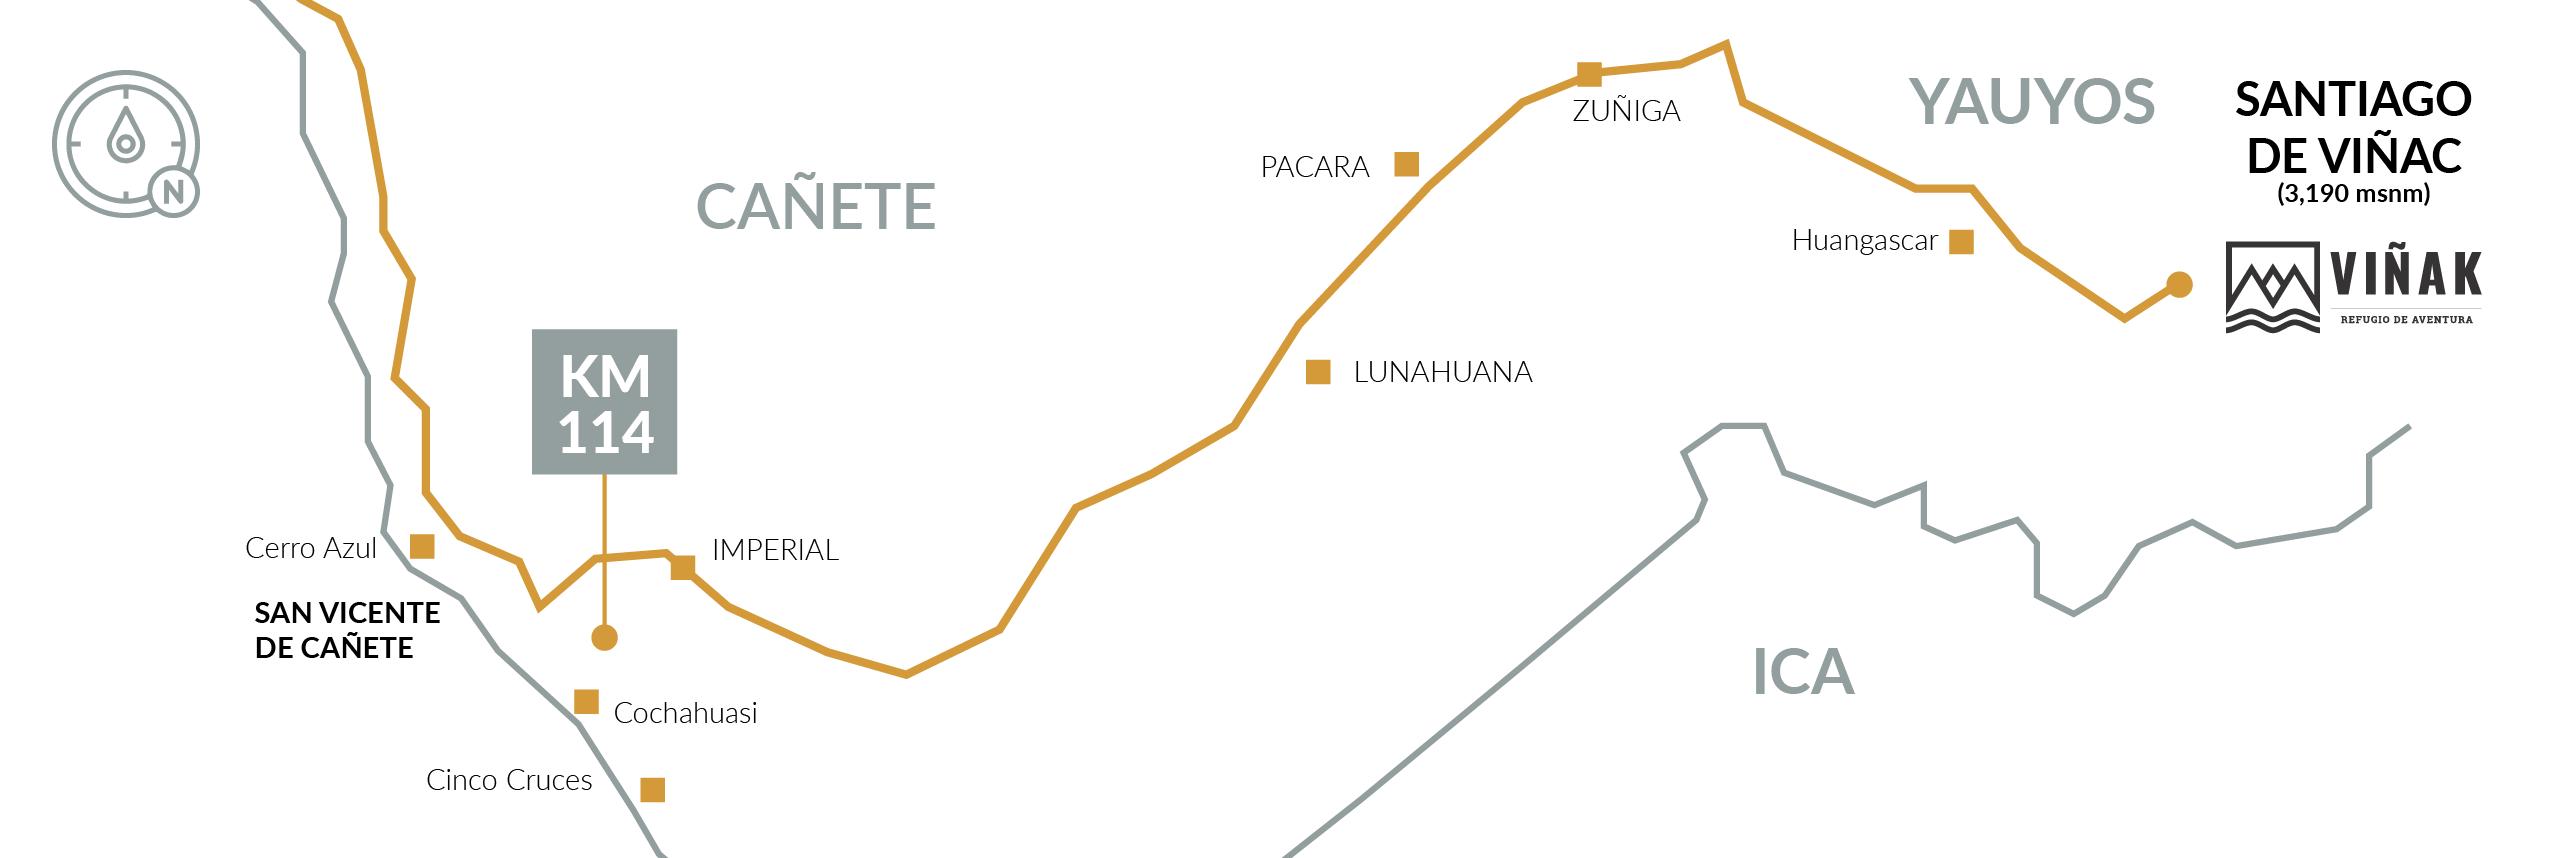 Mapa Refugio Viñak